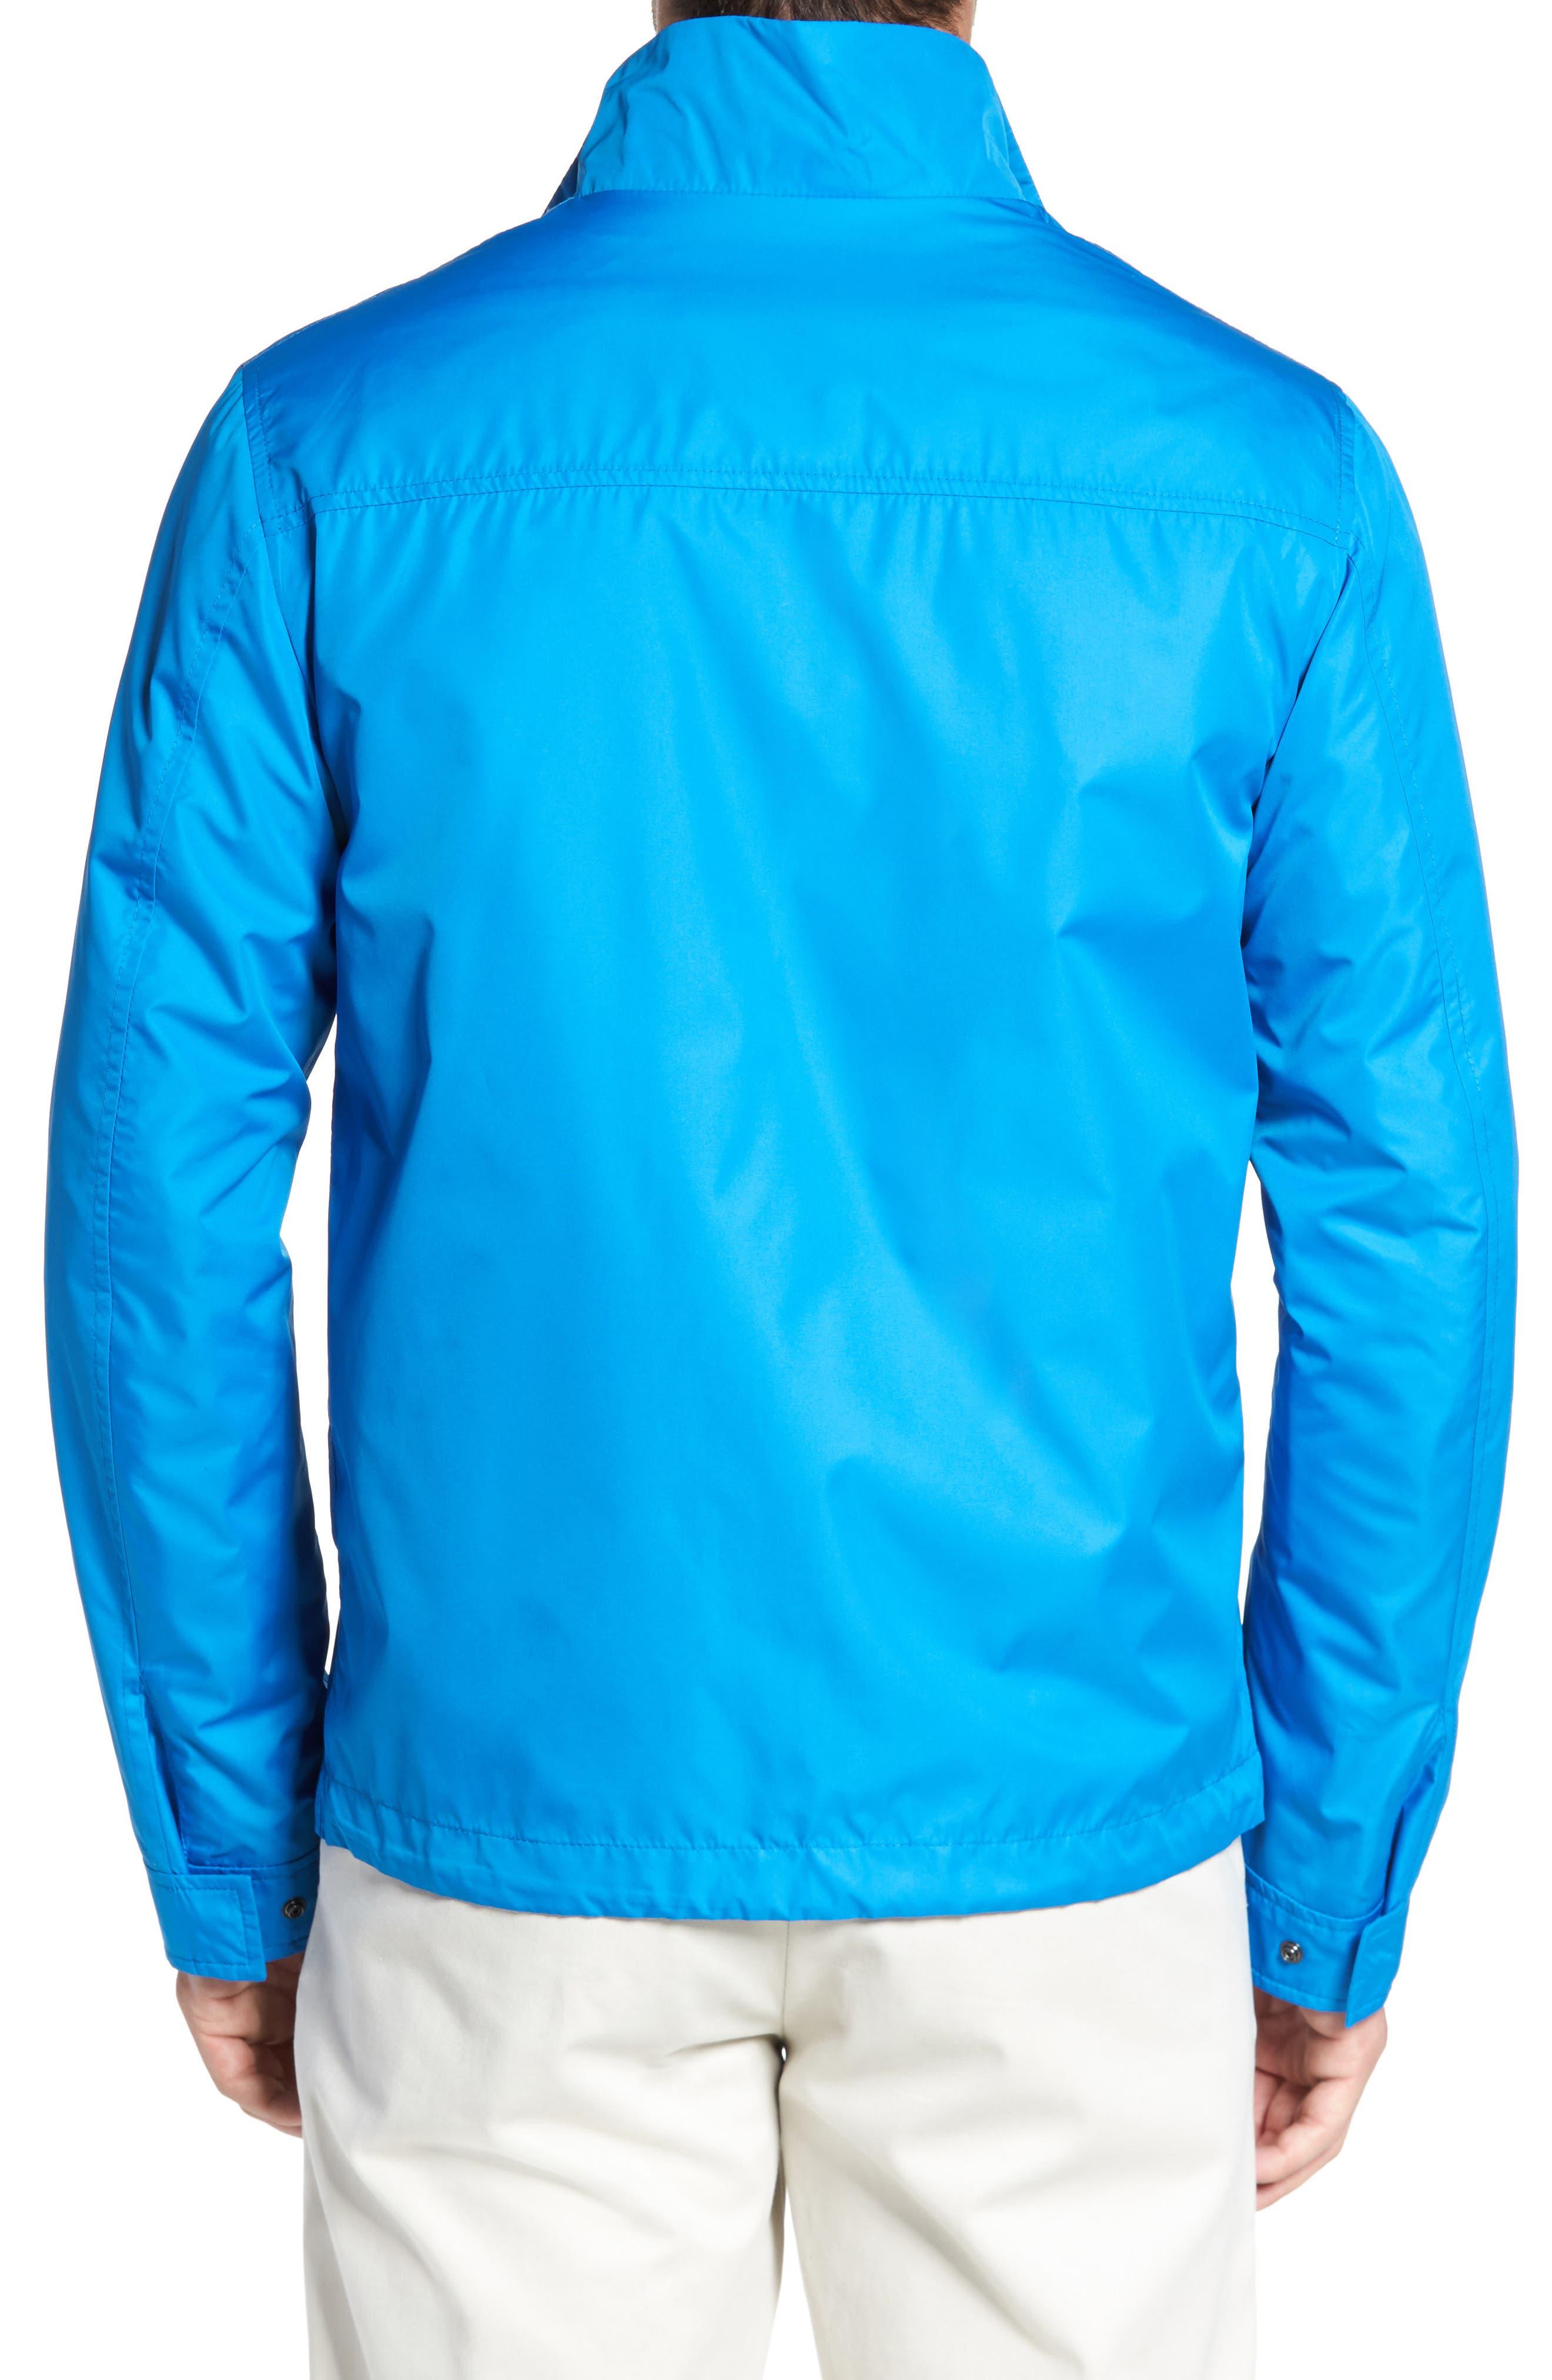 Paul&Shark Water Repellent Jacket,                             Alternate thumbnail 2, color,                             410